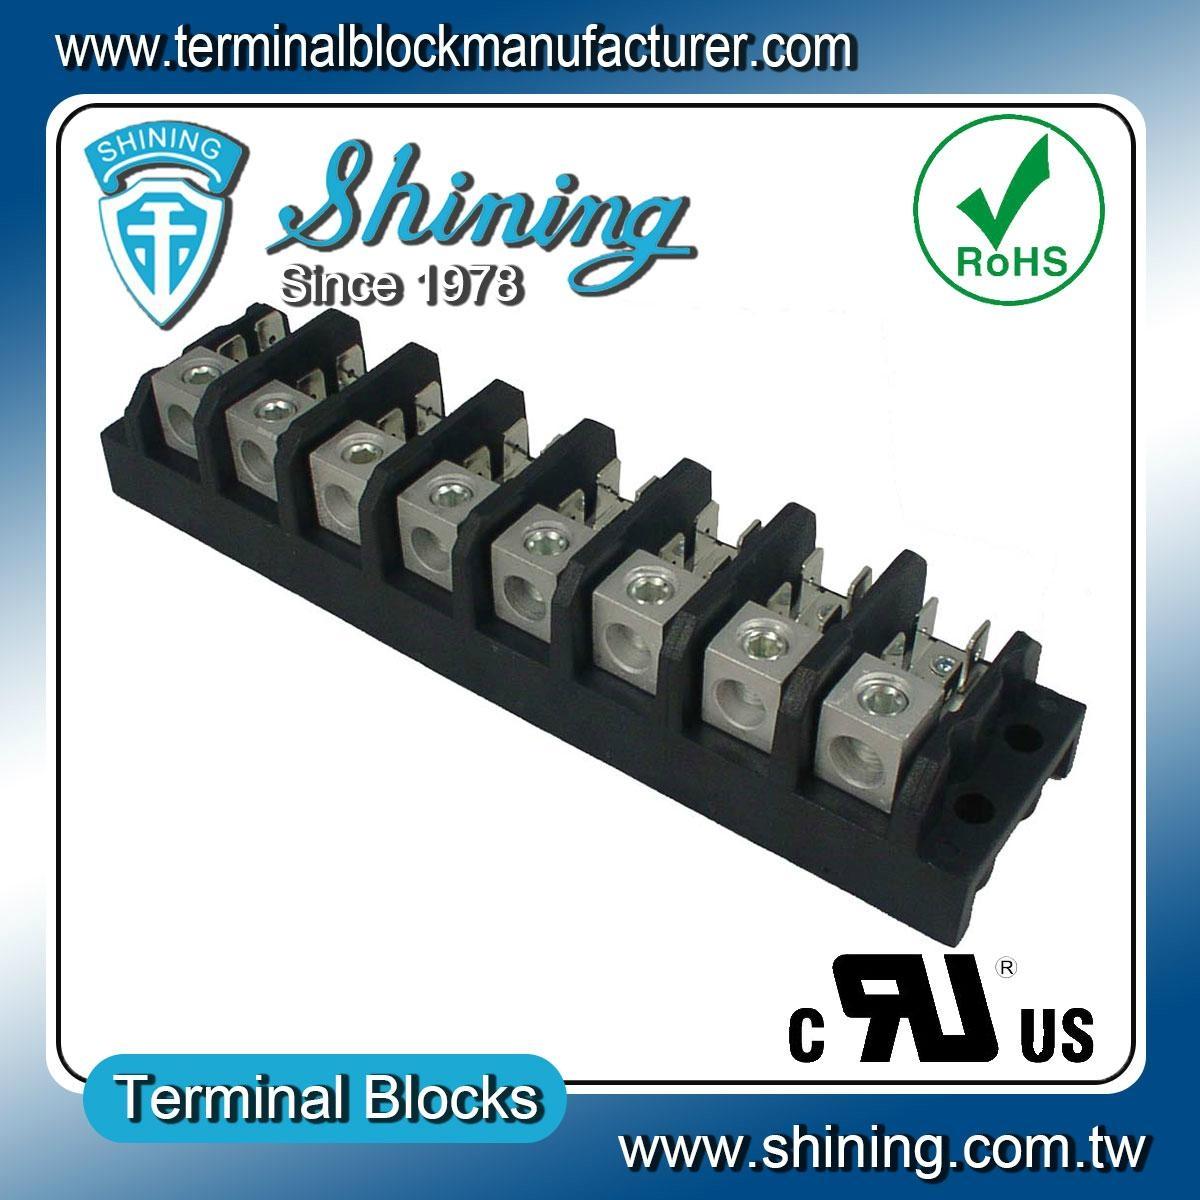 TGP-085-08A 配電端子台 Power Distribution Terminal Block 1